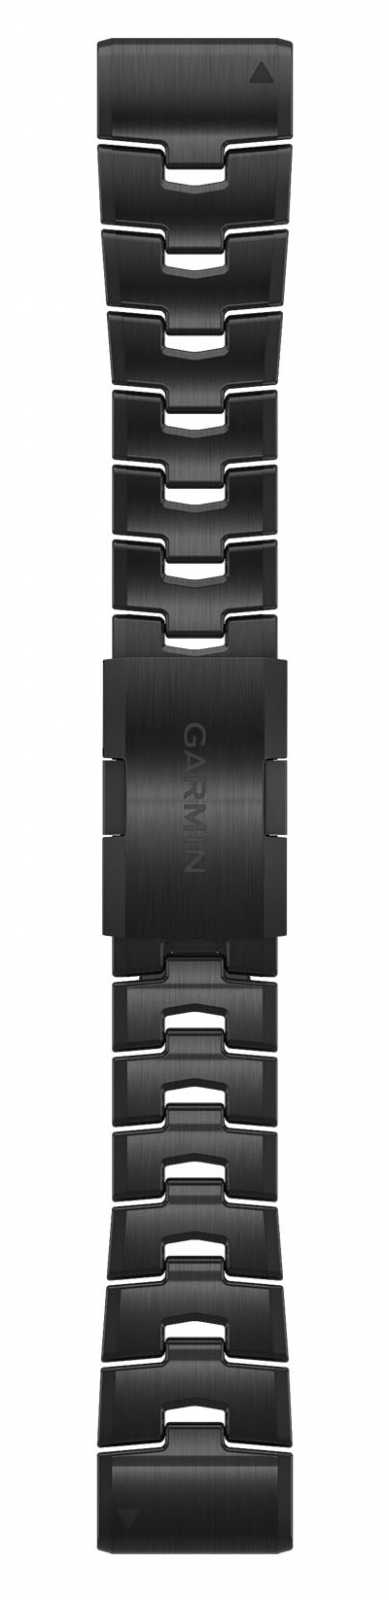 Garmin QuickFit 26 Watch Strap Only, Vented Titanium Bracelet With Carbon Grey DLC Coating 010-12864-09